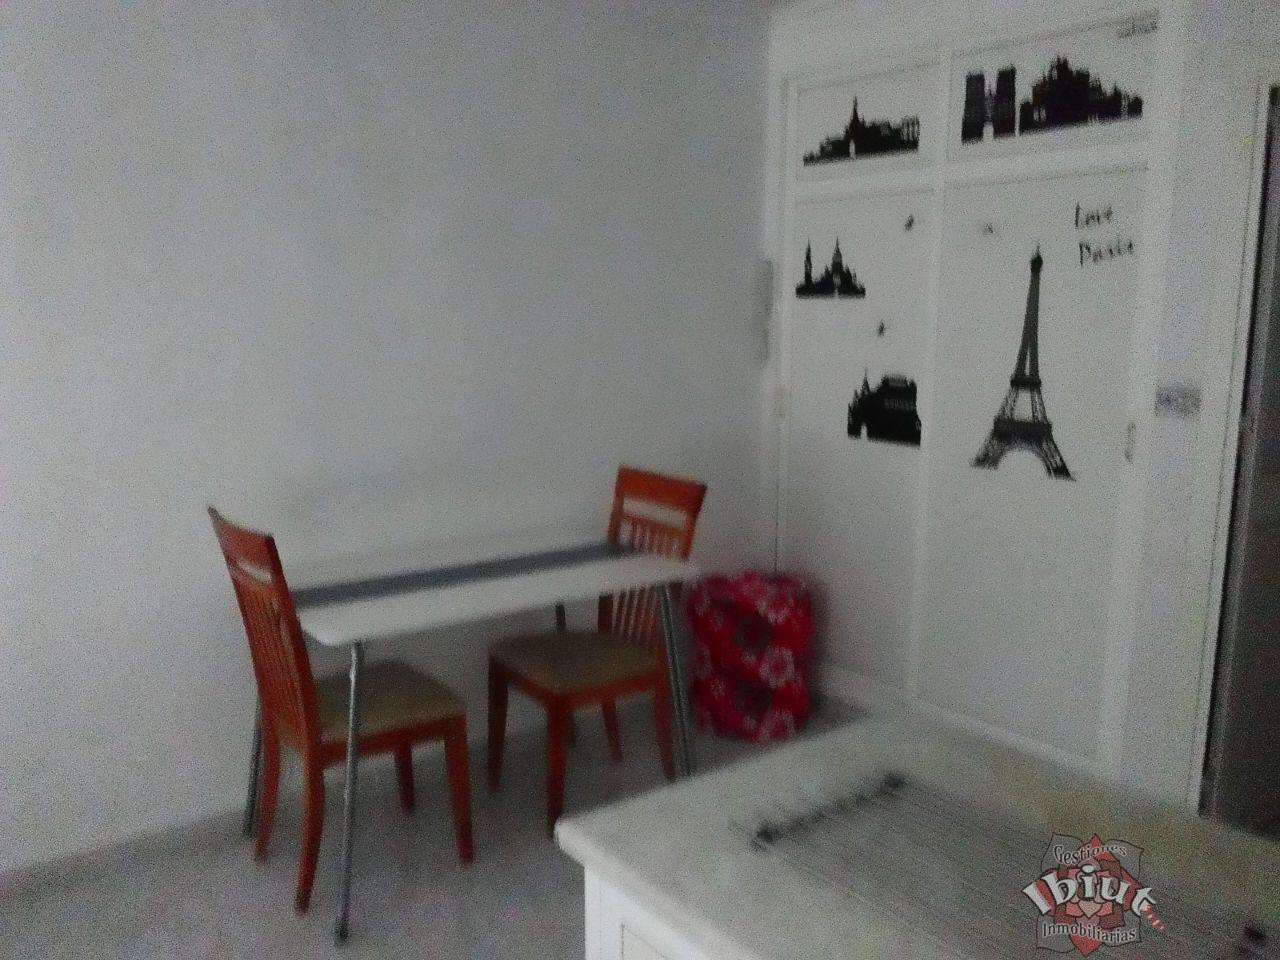 For rent of study in La Cala del Moral